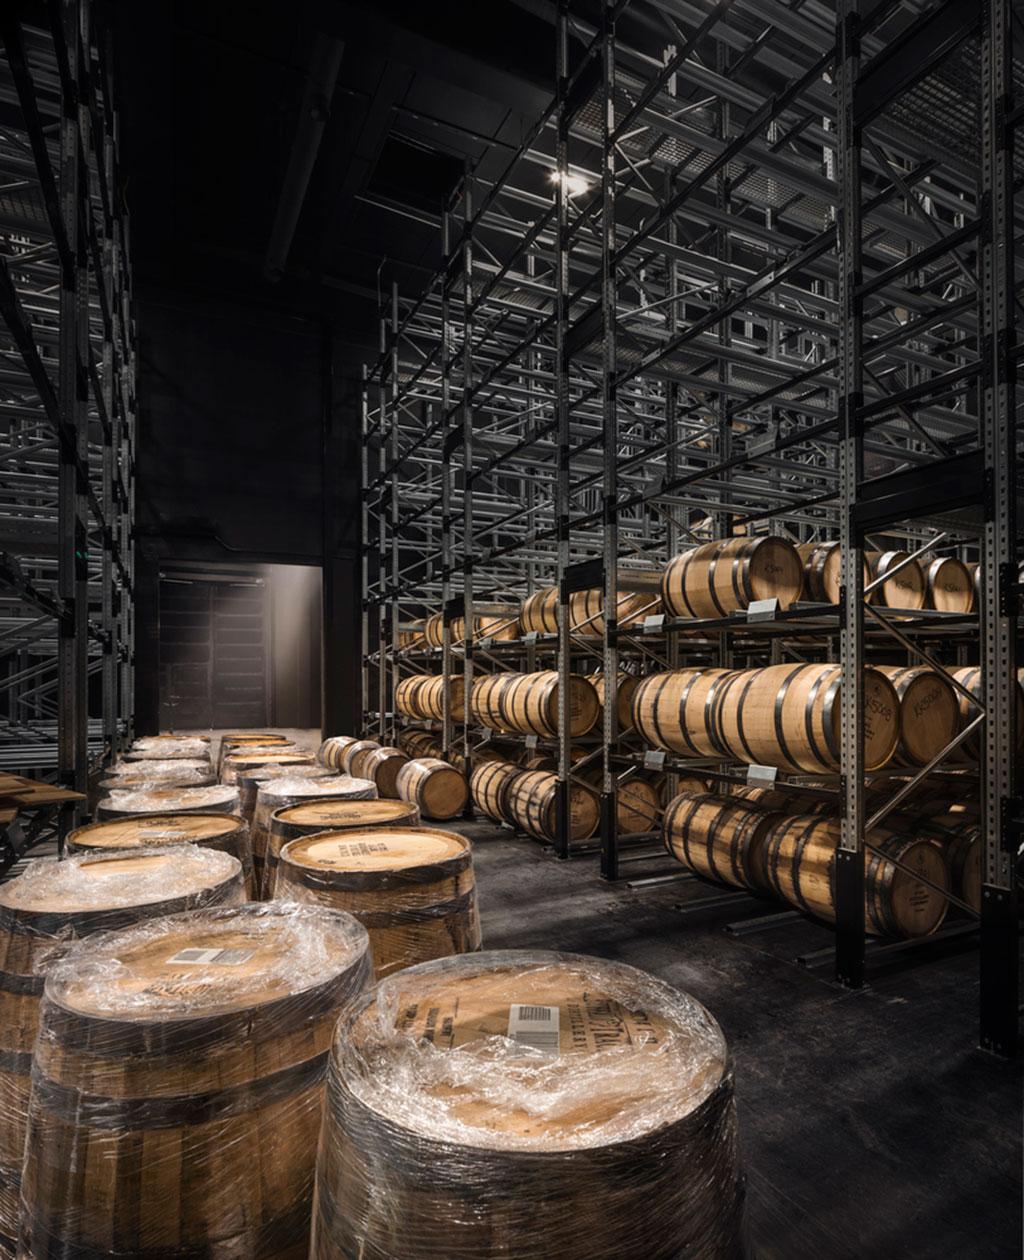 Kyrö Distillery barrel storage building designed by Avanto Architects